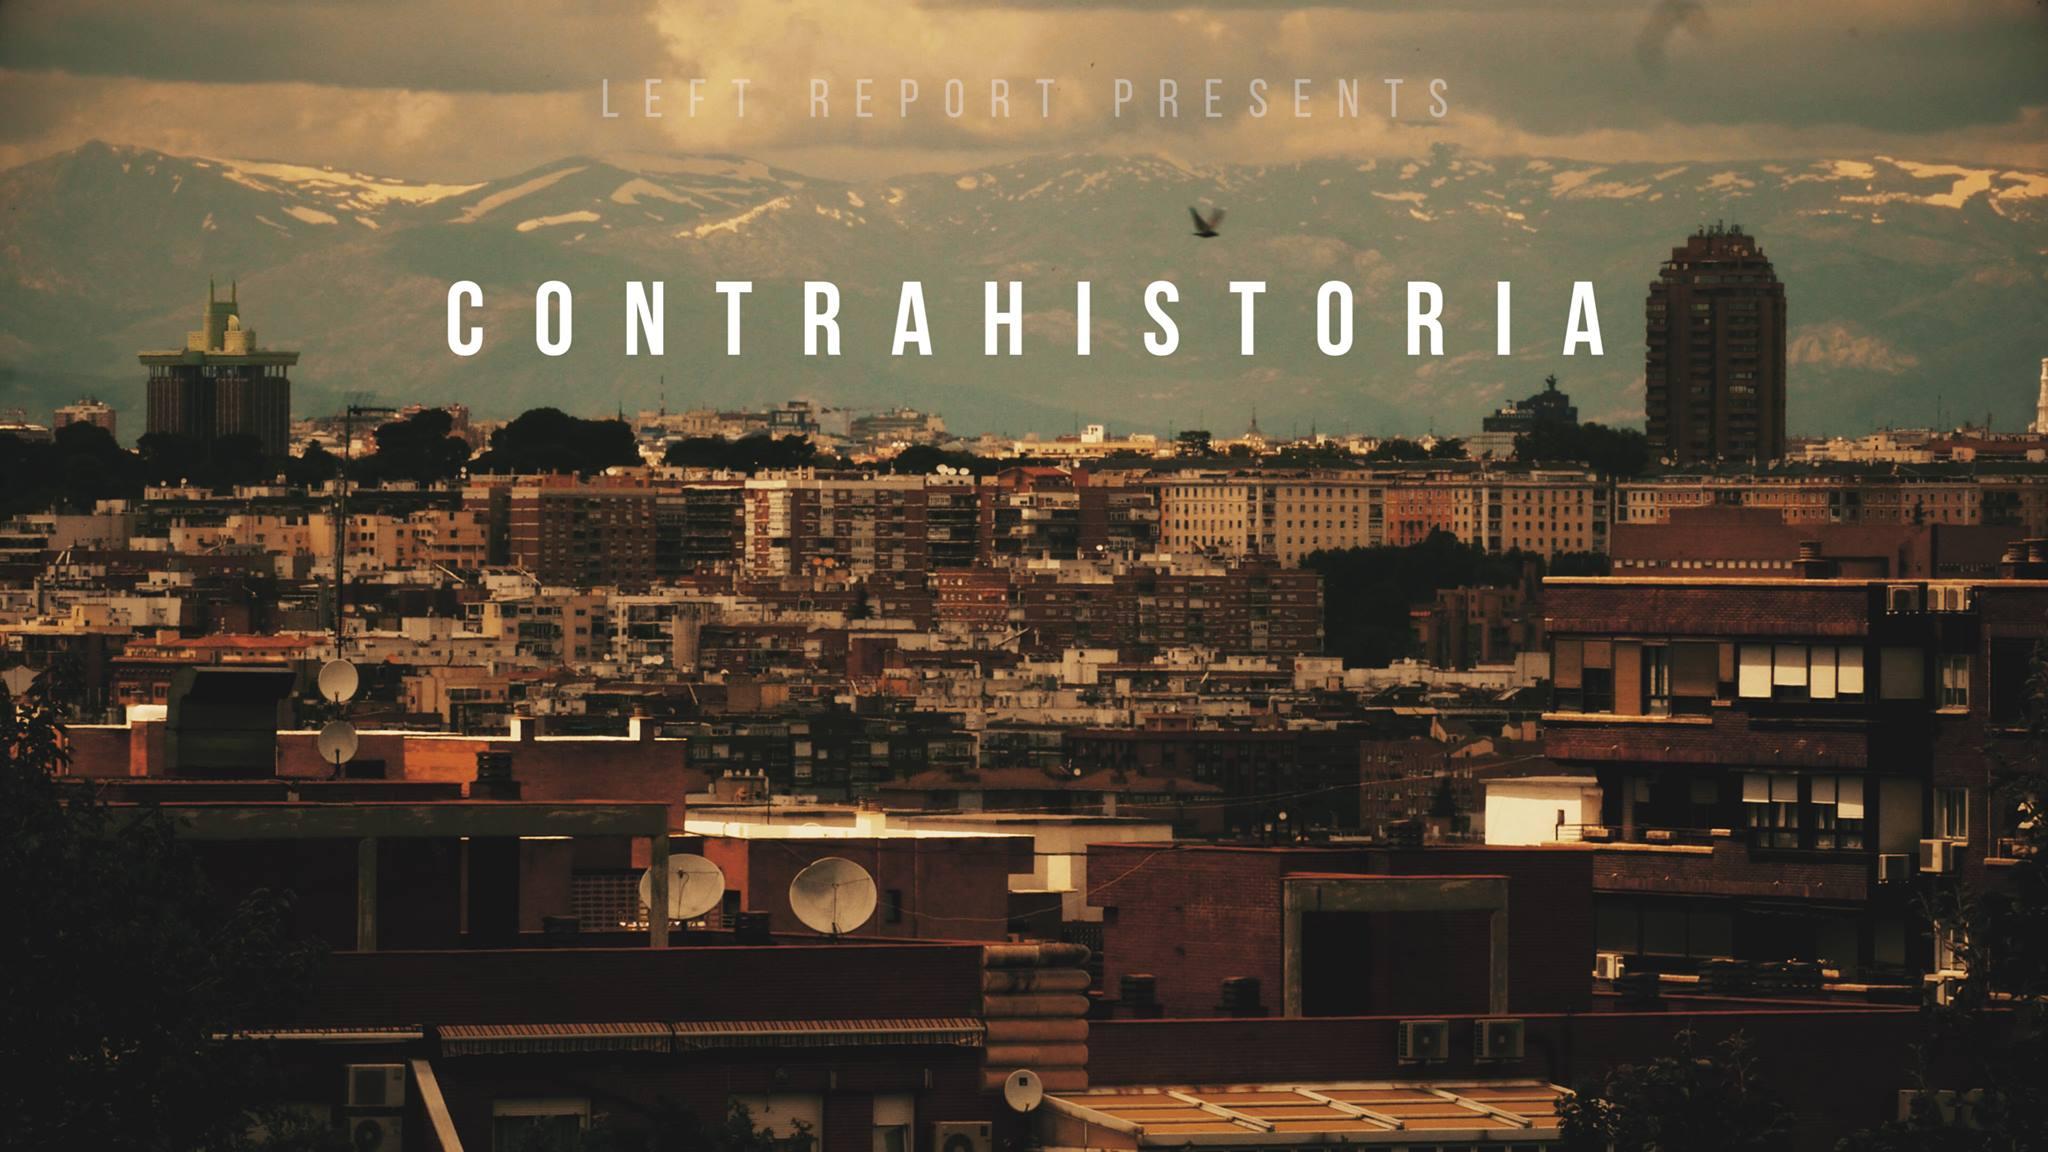 Dokumentation – Contrahistoria